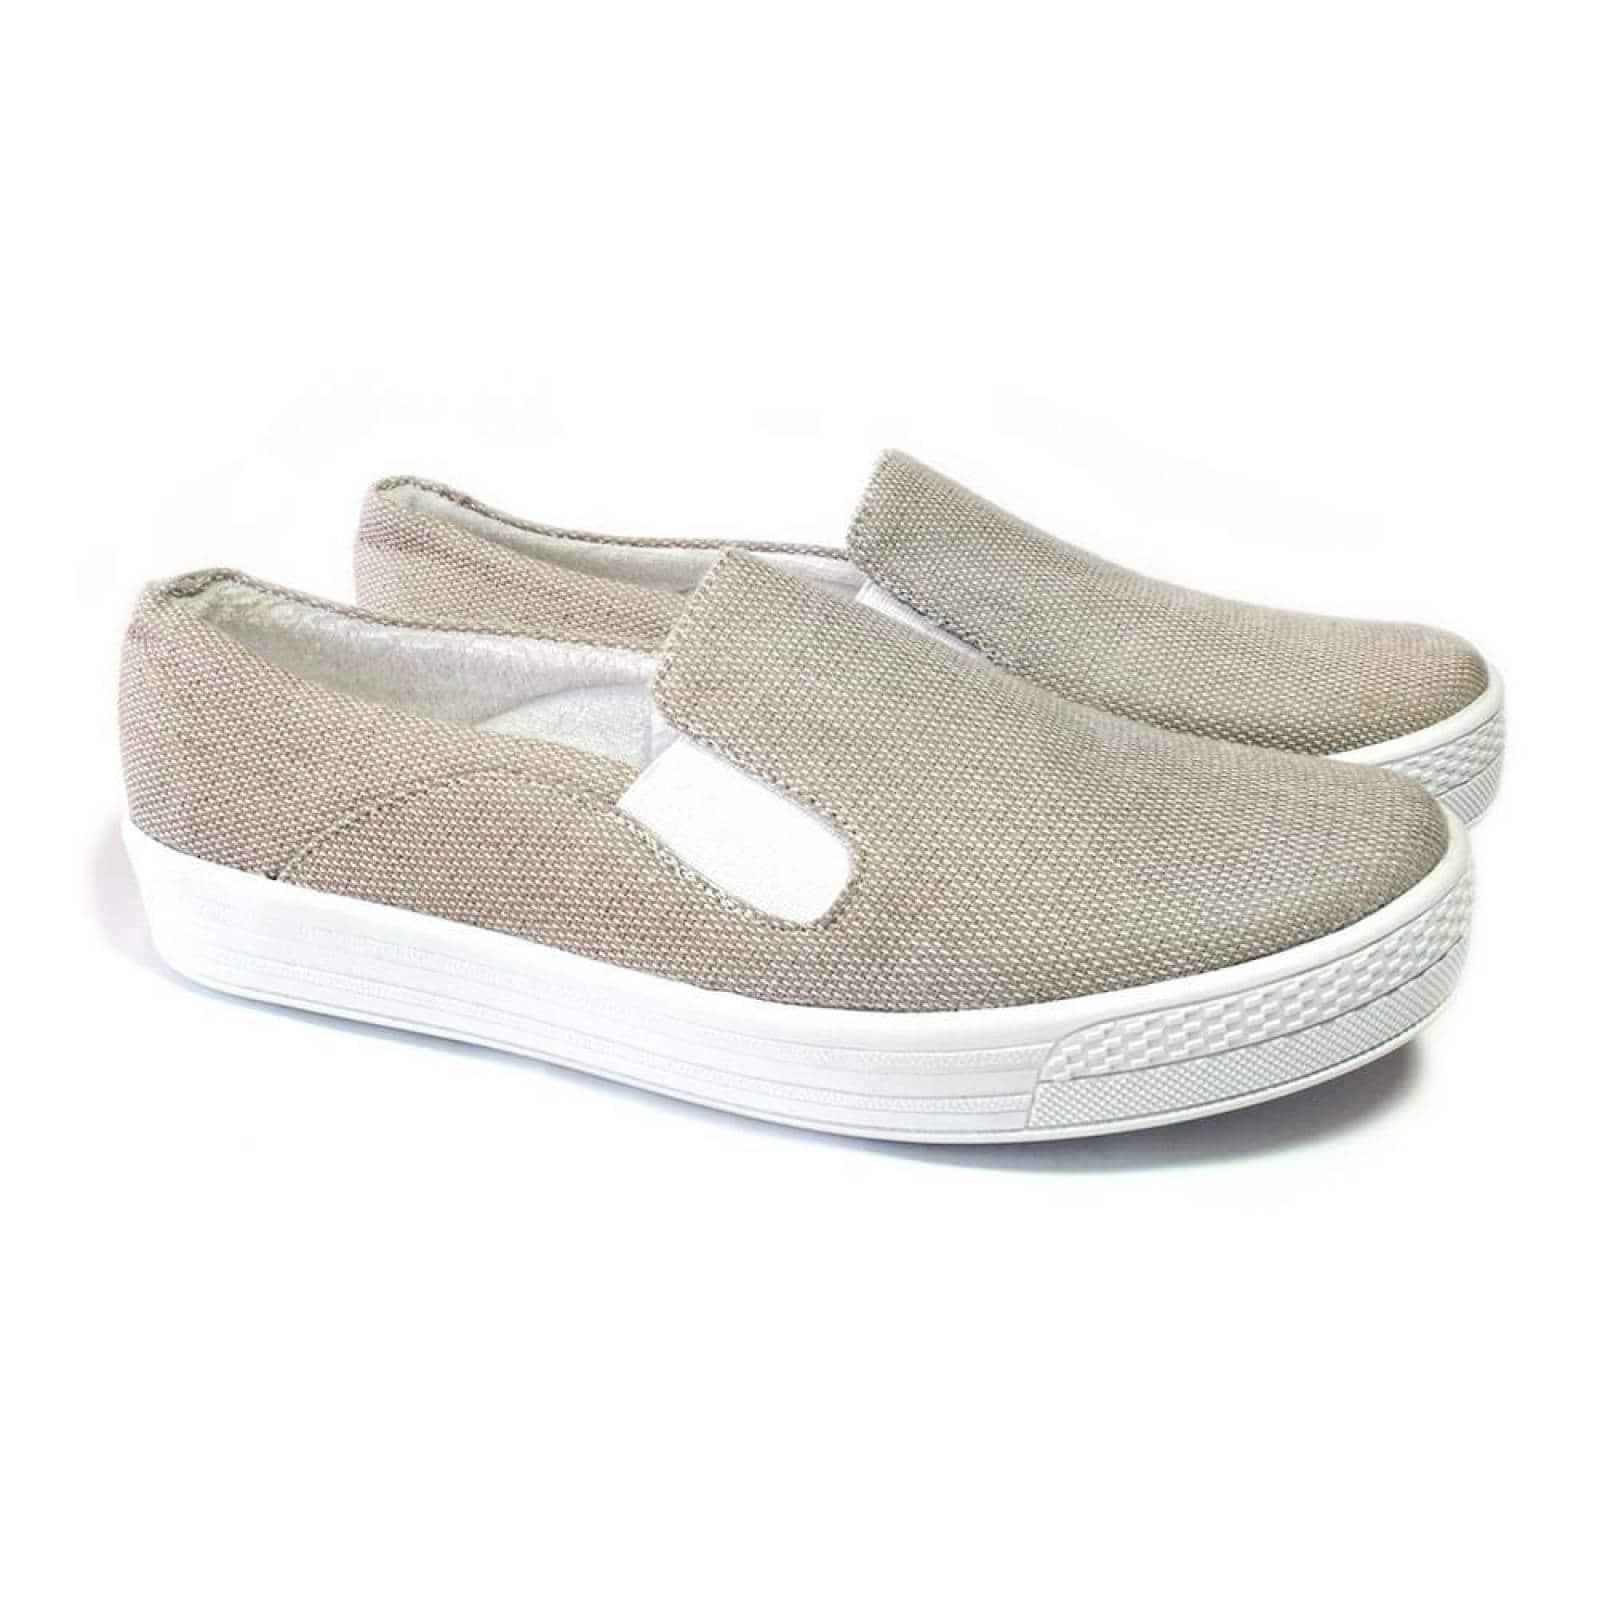 Tenis Zapato Slip On Artesanal Tela Mujer Lola Beige Komoni Talla: 24